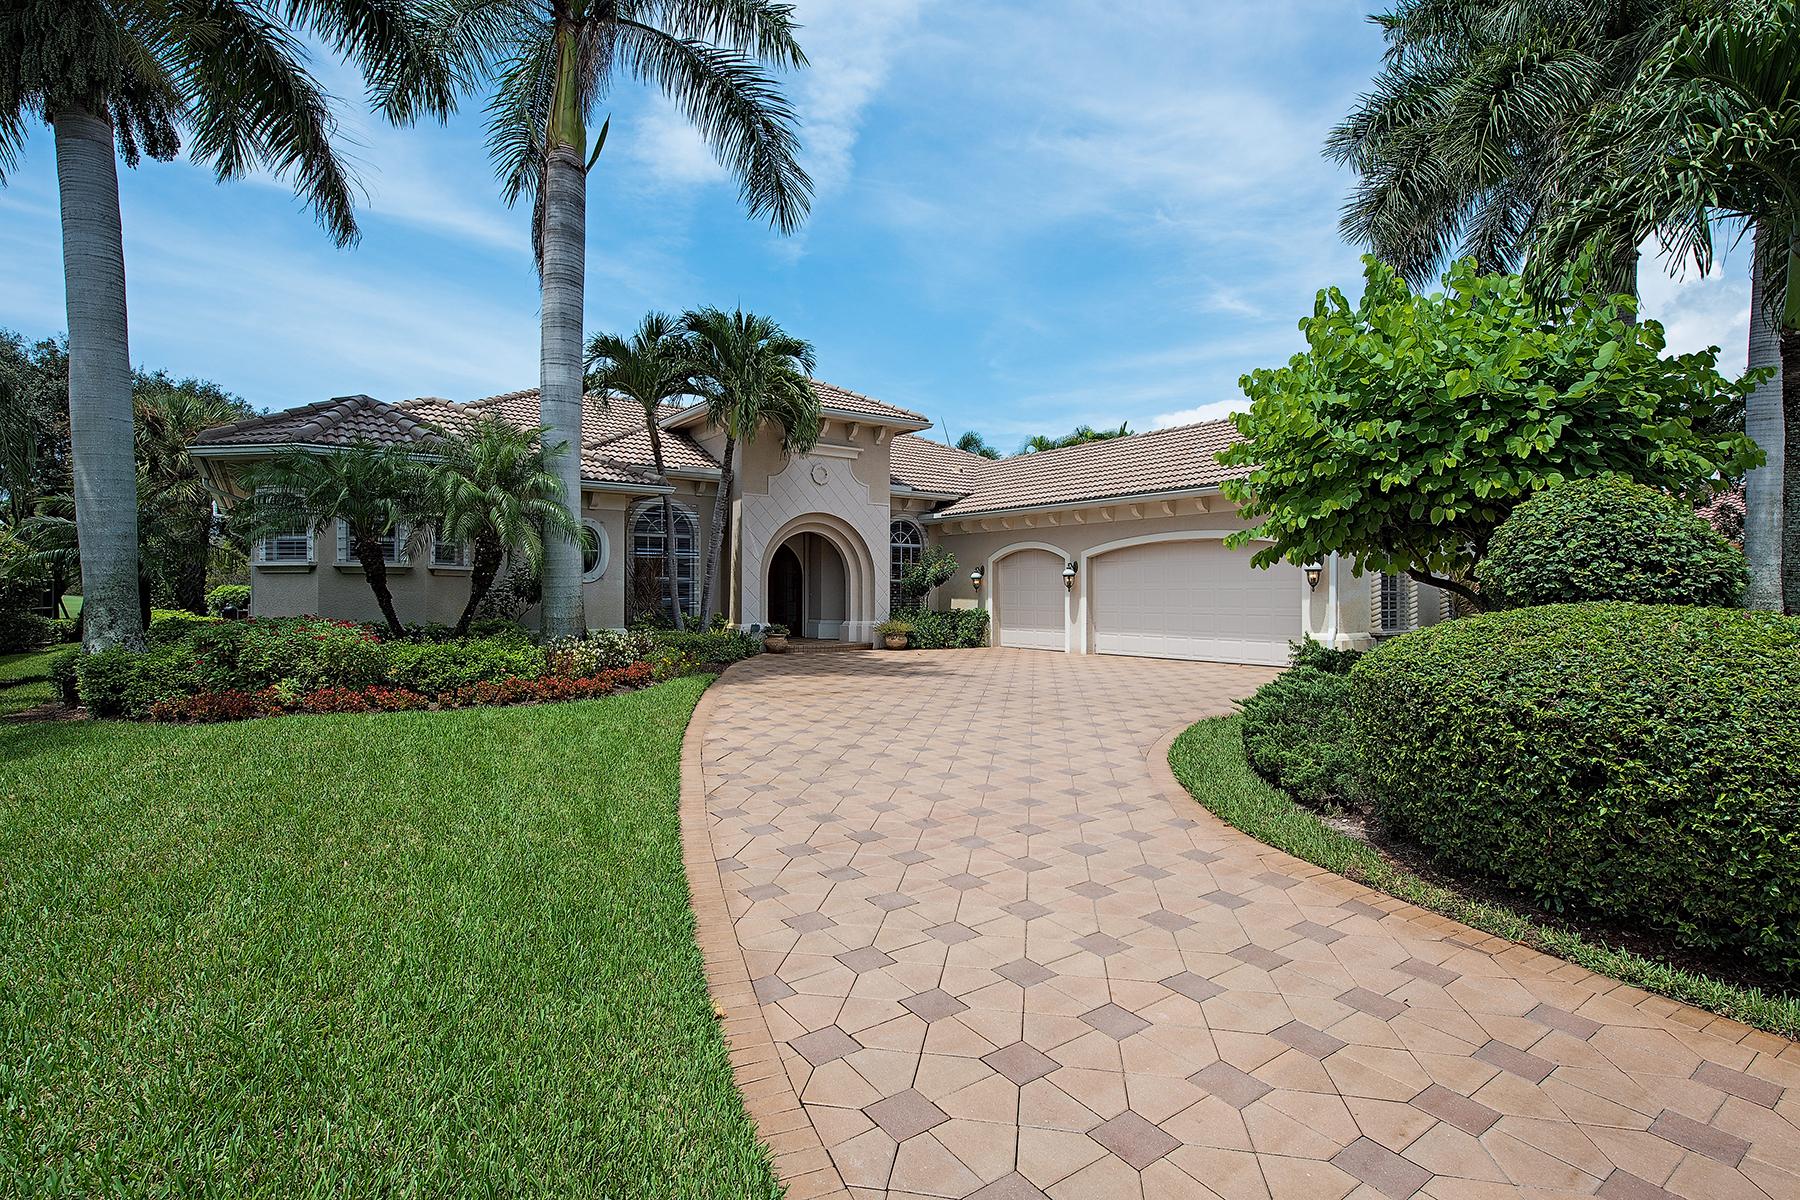 Moradia para Venda às KENSINGTON - KENSINGTON GARDENS 2983 Gardens Blvd Naples, Florida 34105 Estados Unidos